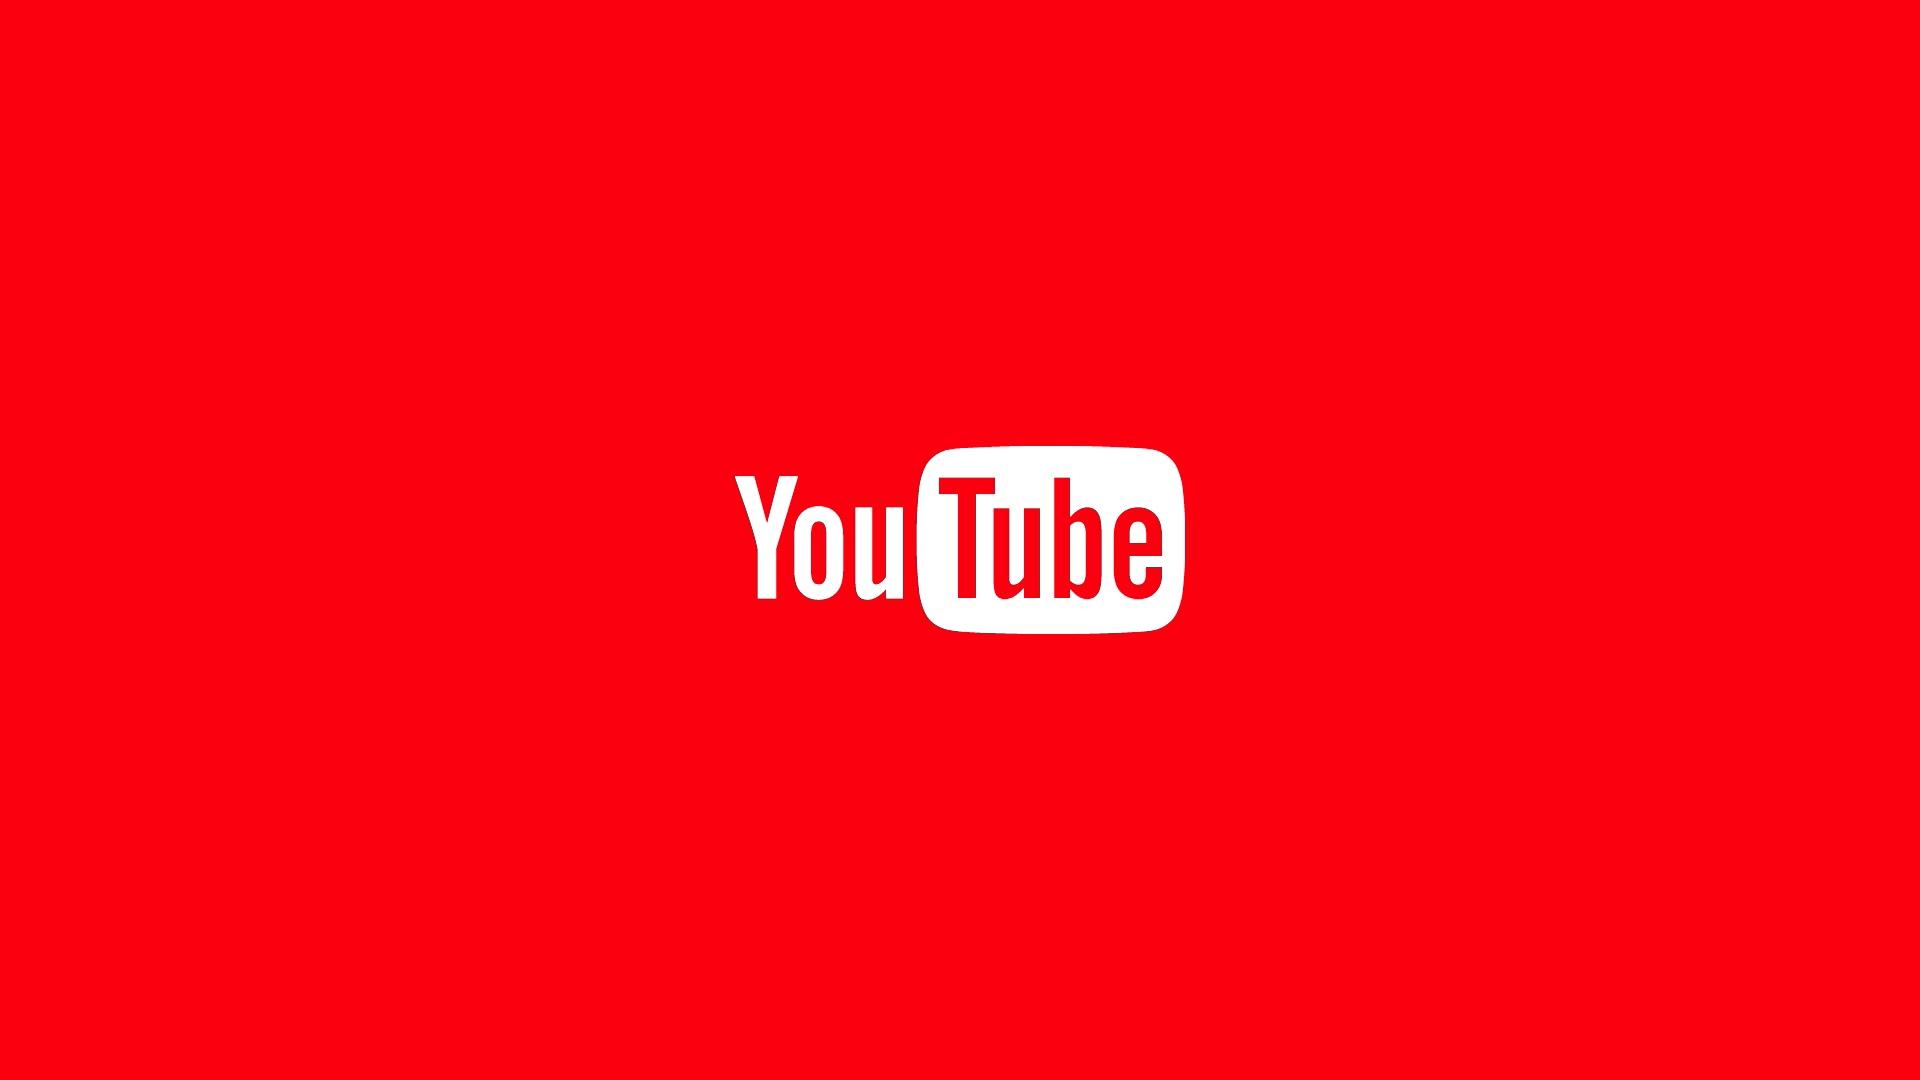 YouTube ухудшил качество видео из-за коронавируса